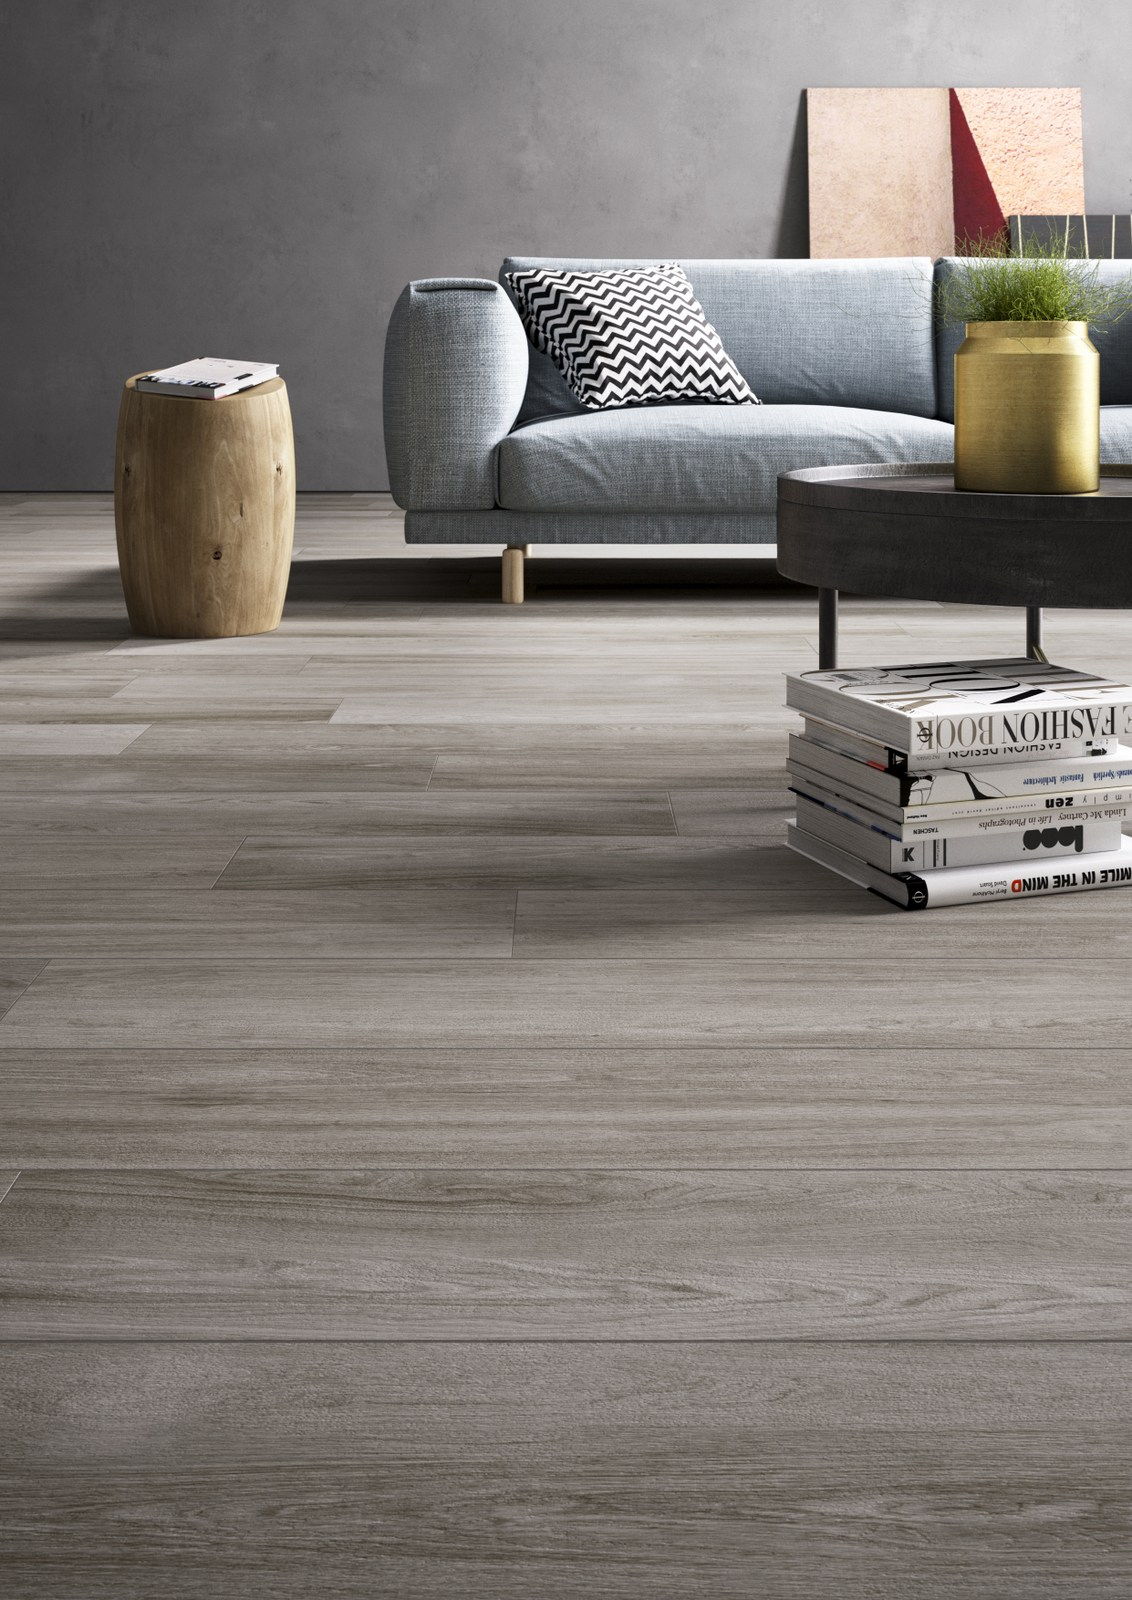 Pavimento de gres porcel nico imitaci n madera q style by - Pavimento gres porcelanico ...